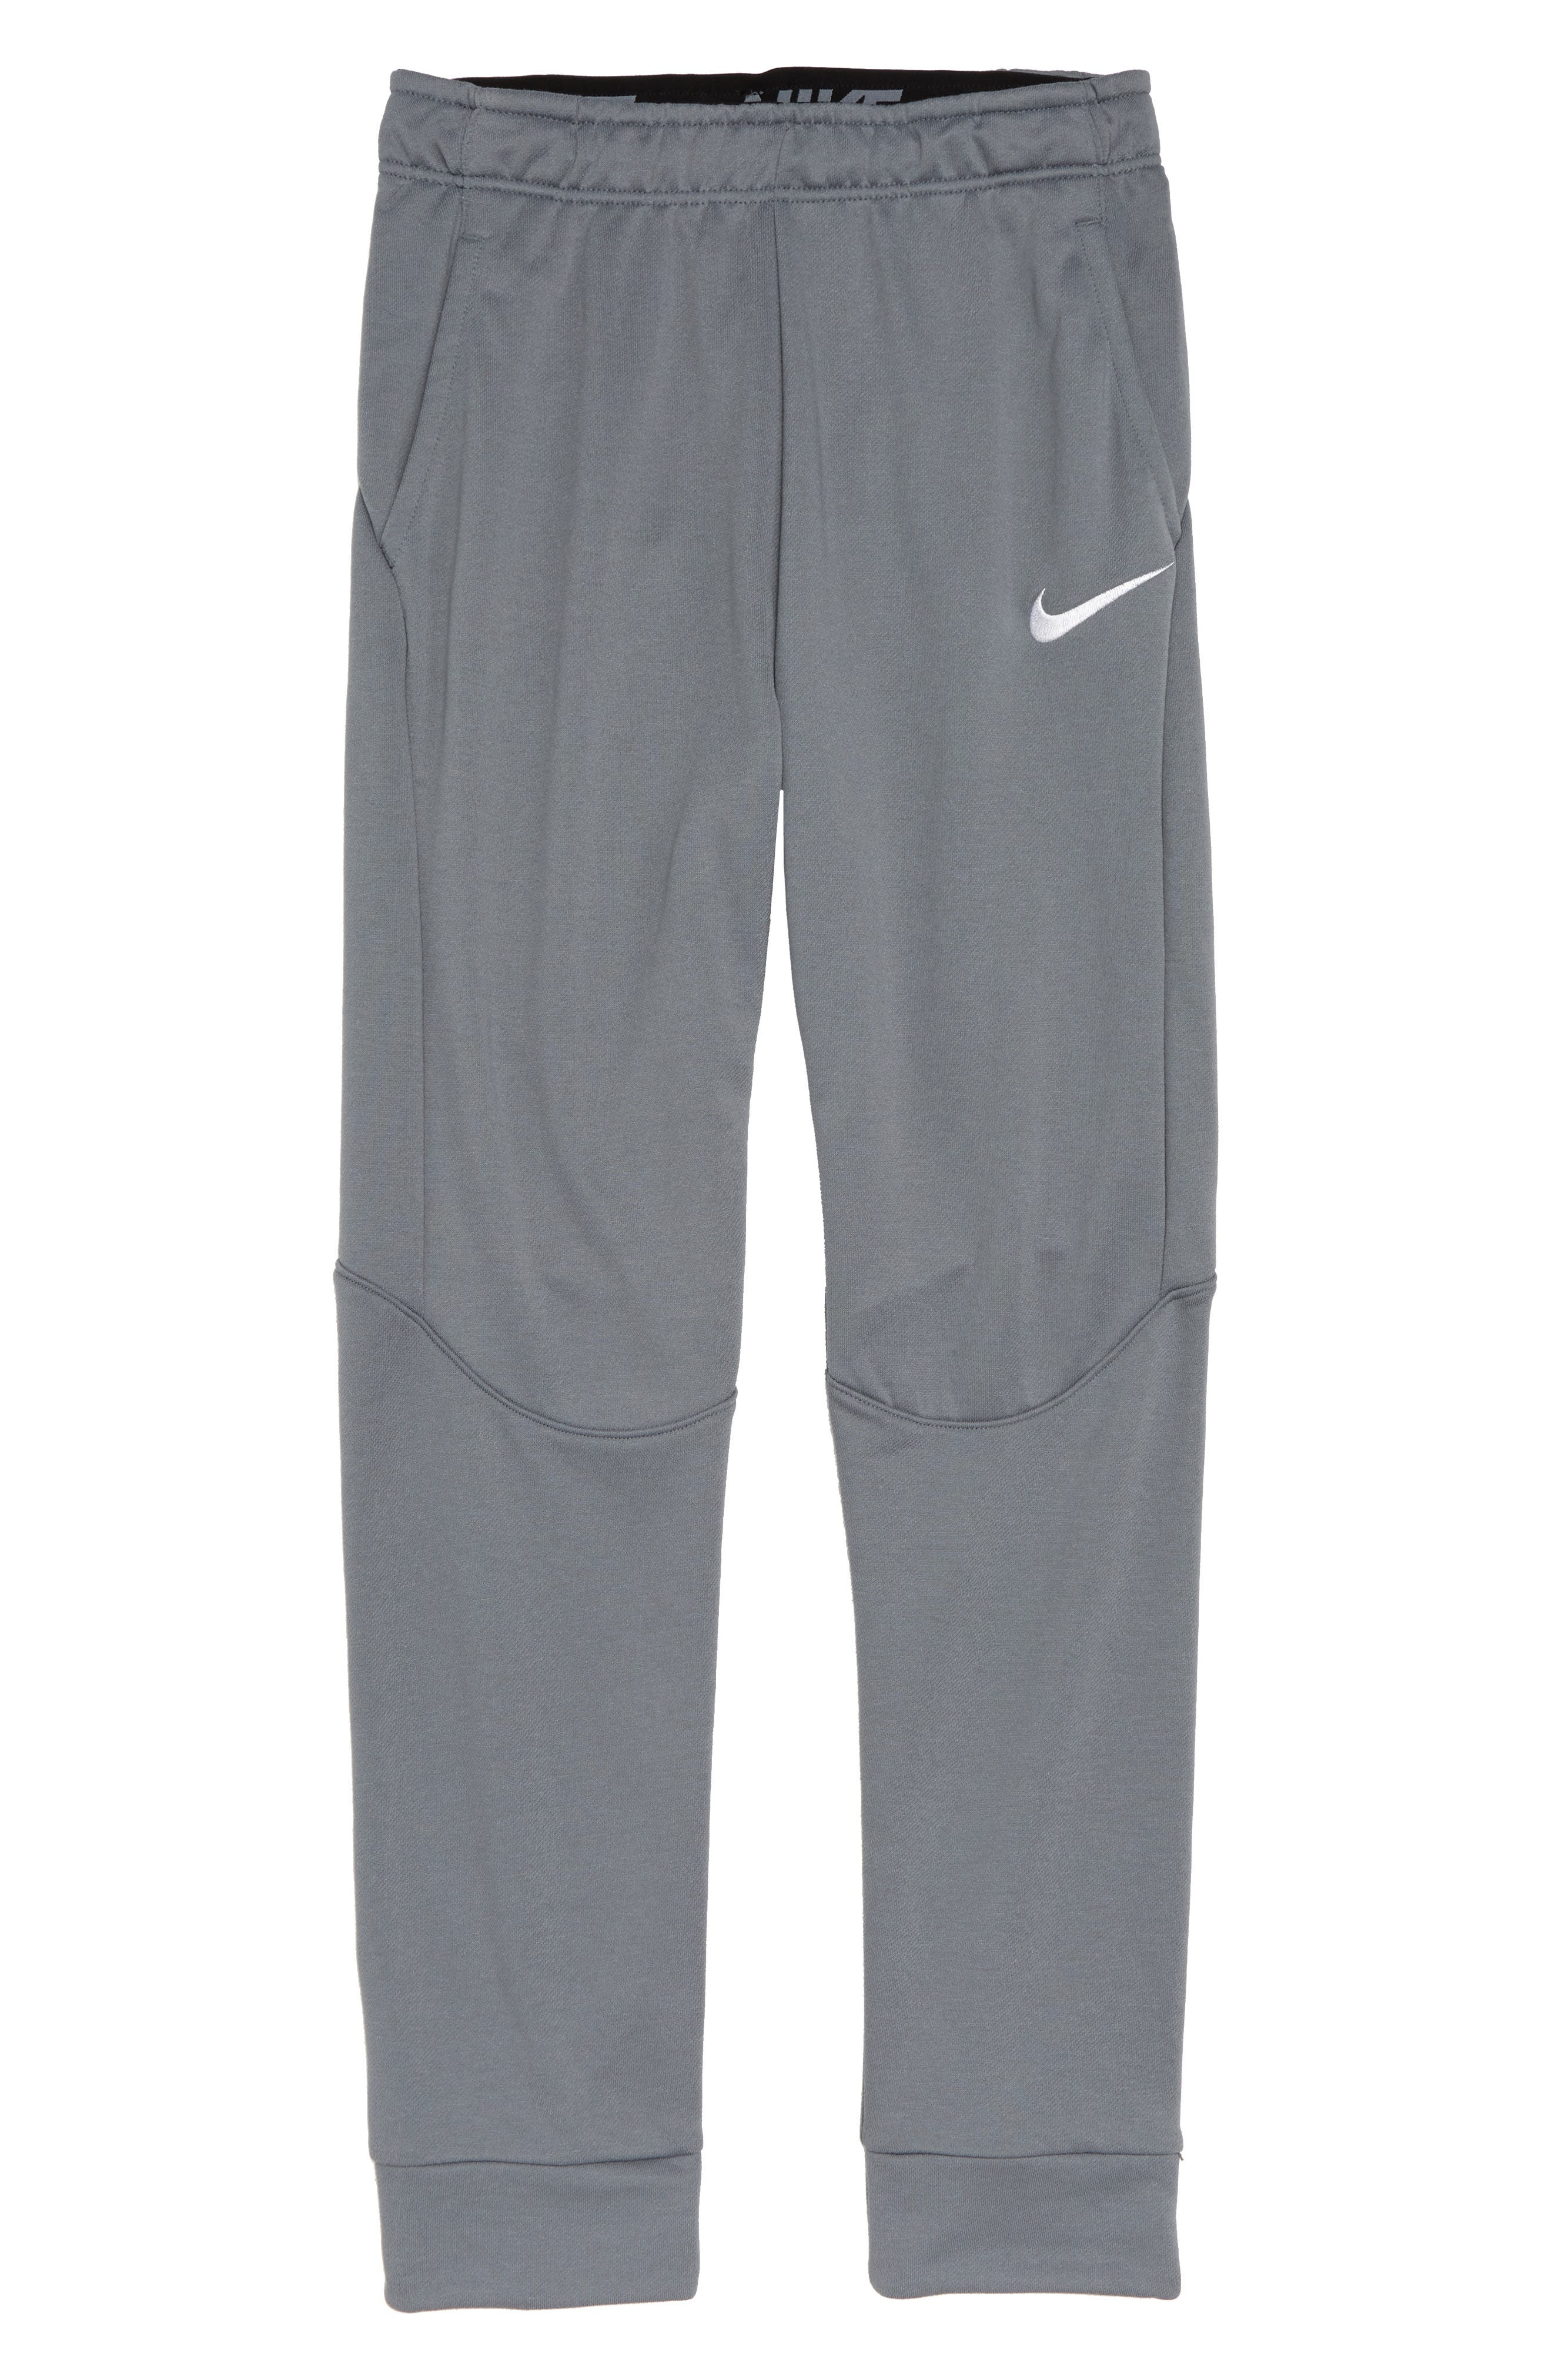 Dry Fleece Training Pants,                         Main,                         color, Cool Grey/ White